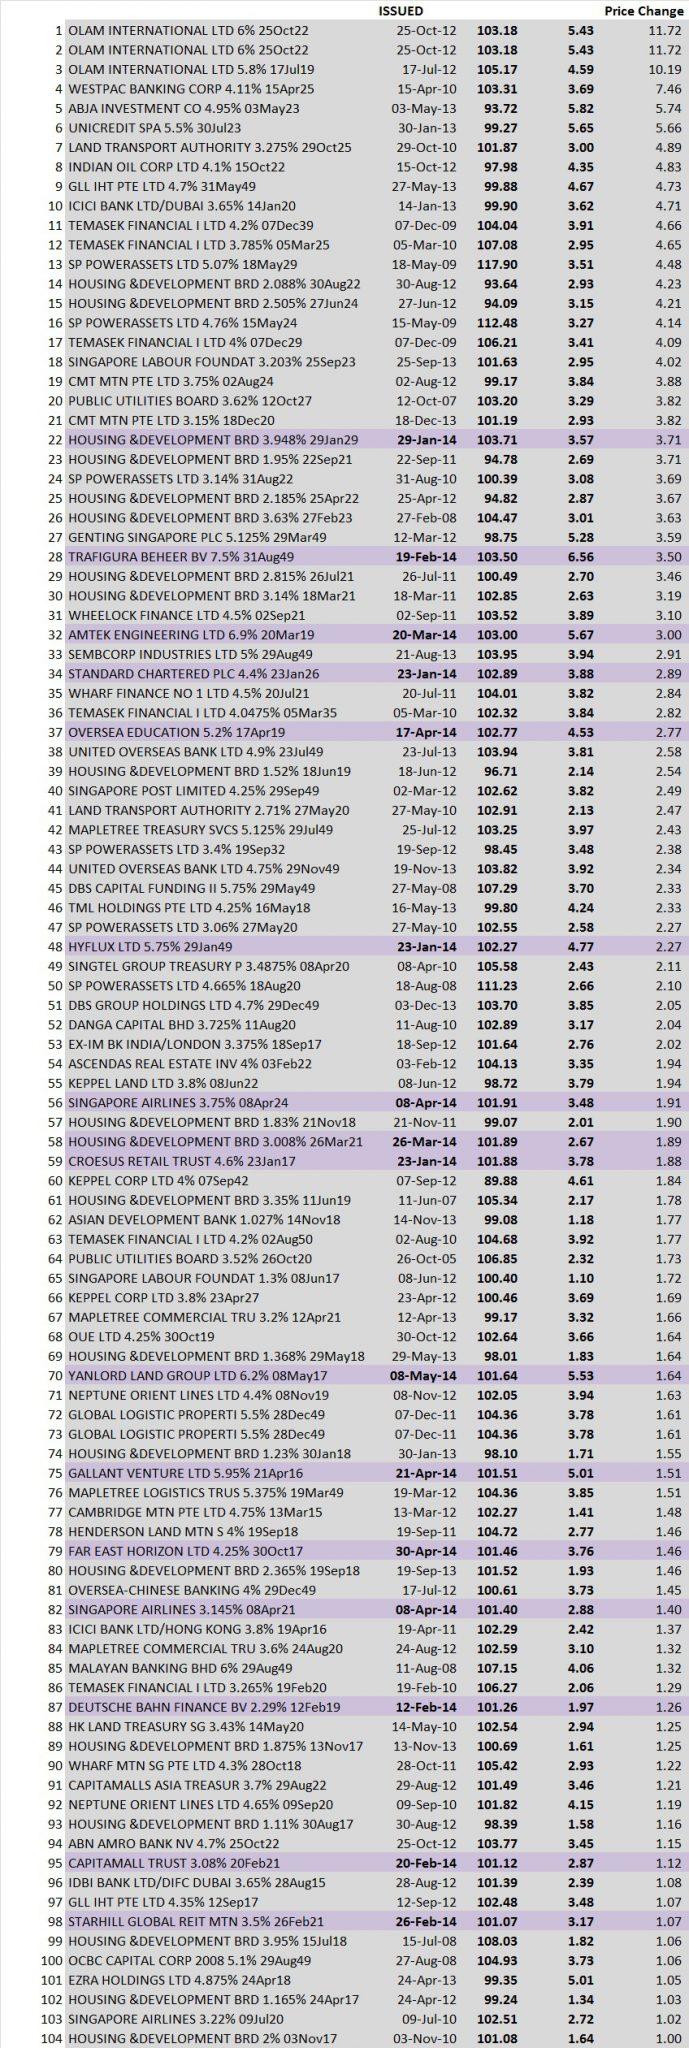 BEST PERFORMING SGD BONDS 2014